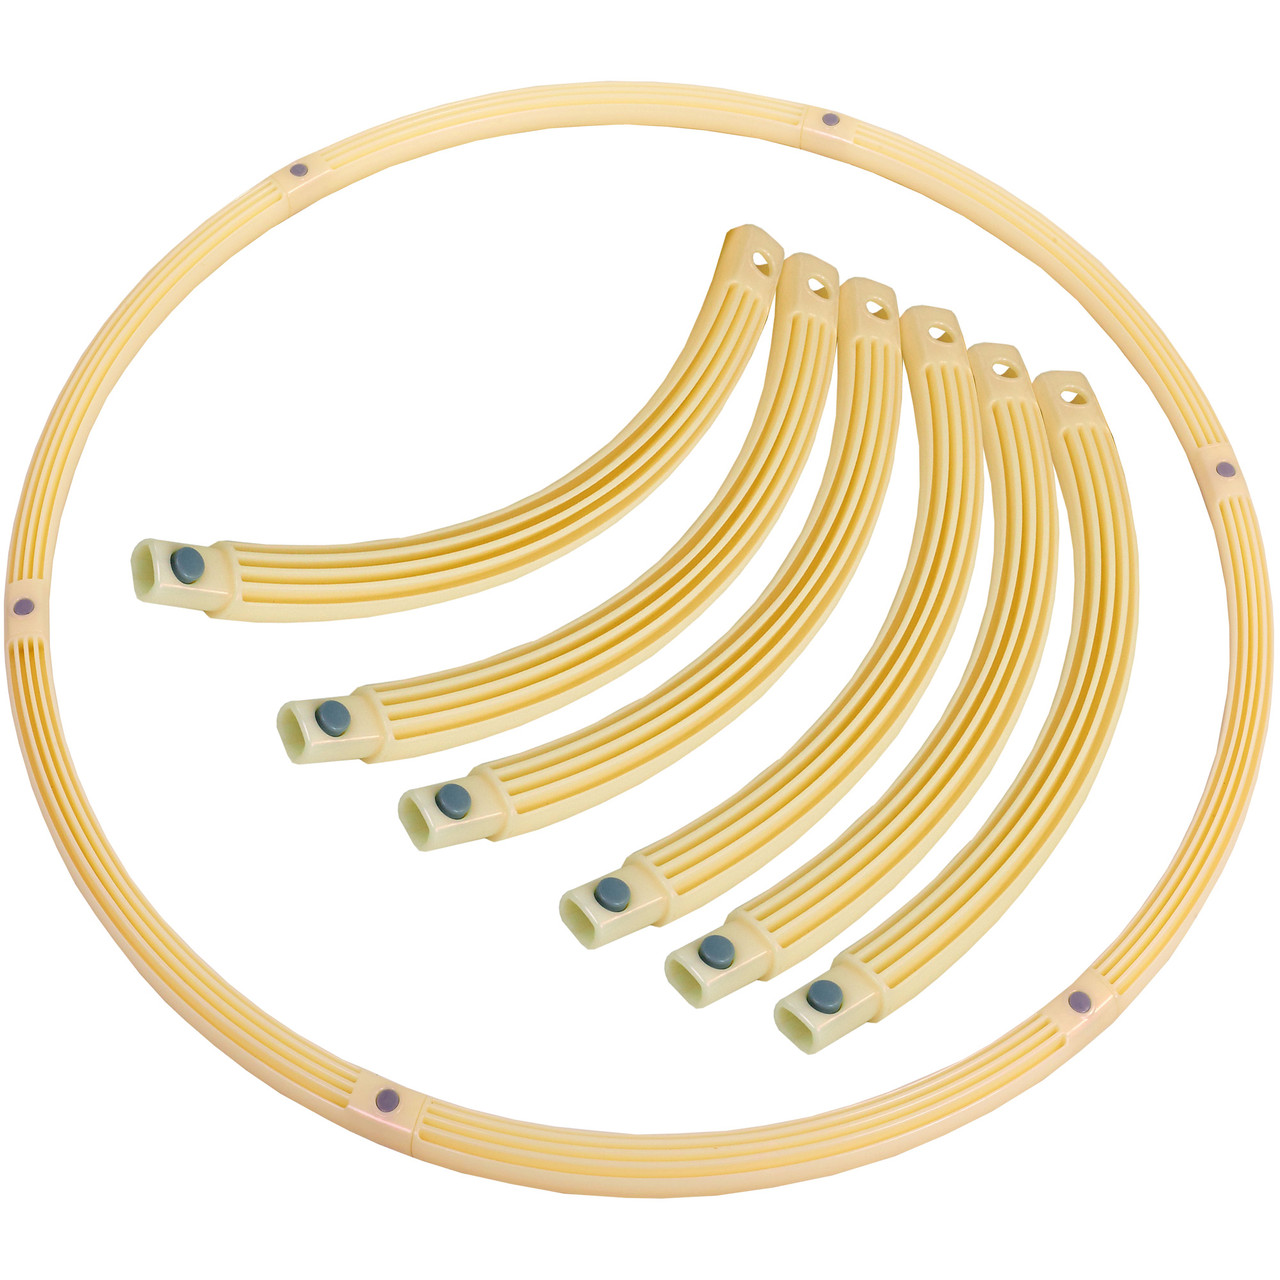 Обруч складной Хула Хуп Pro Supra Hula Hoop PEARL HU-LA HR-056 (1кг, пластик, 6 секций, d-90см)